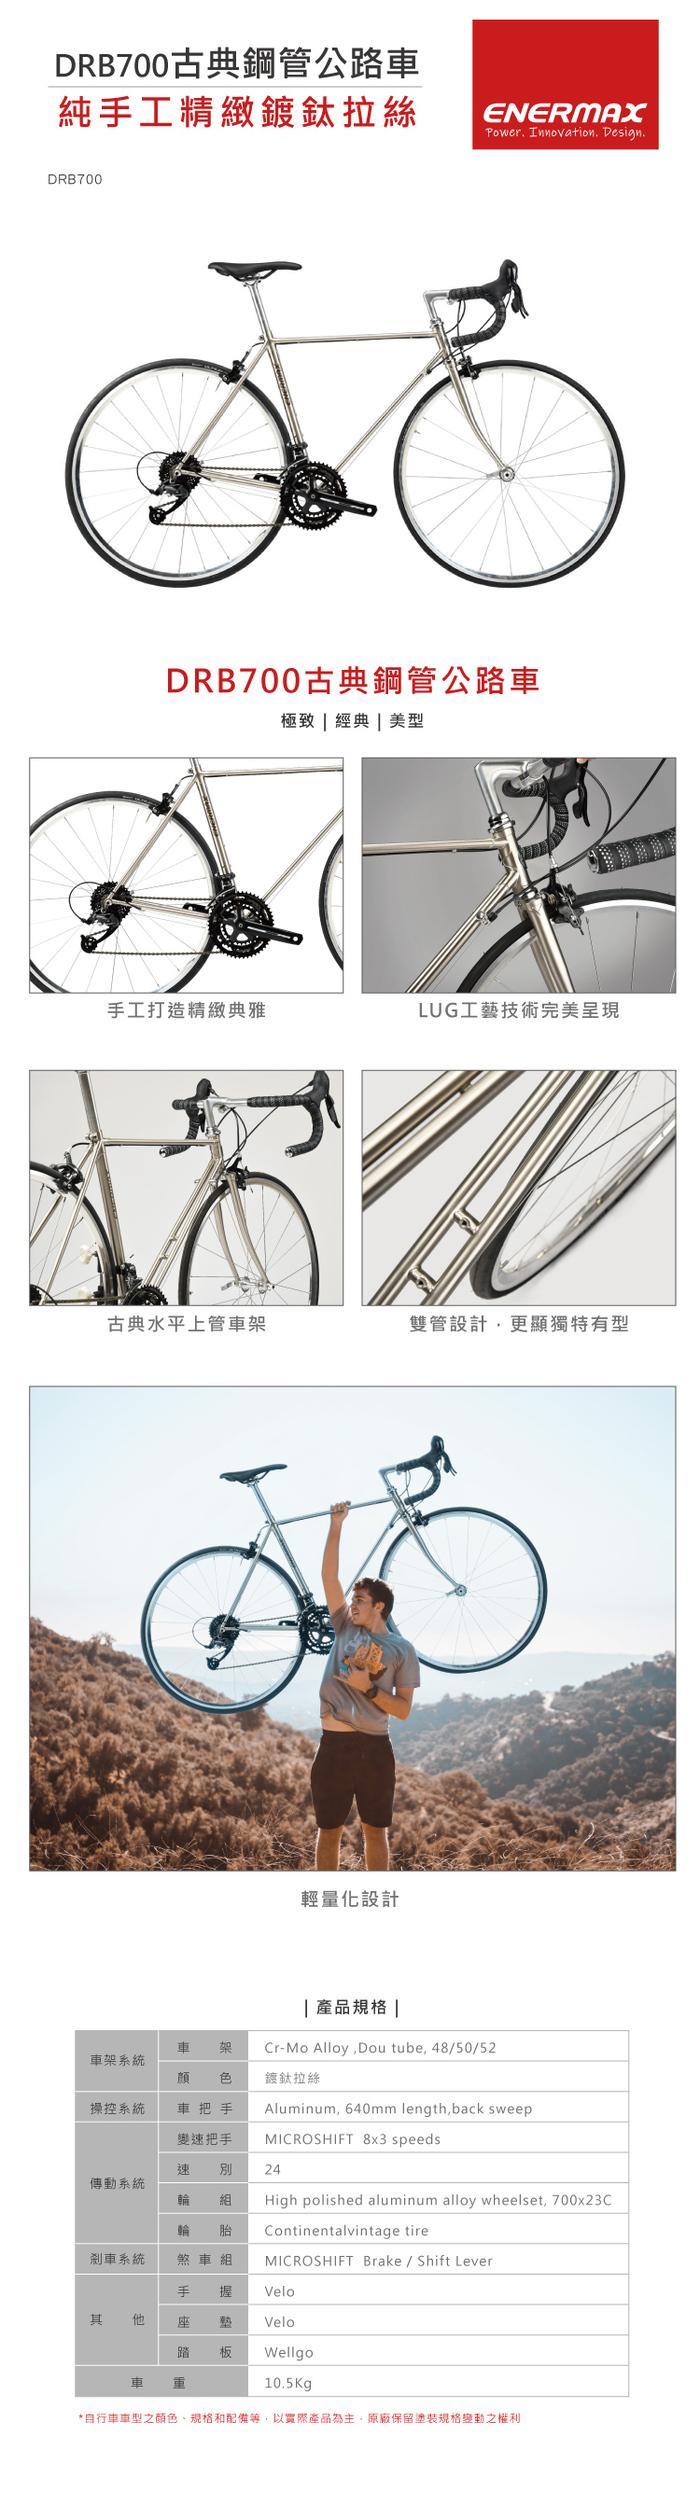 ENERMAX安耐美|CB700-BL古典城市休閒自行車